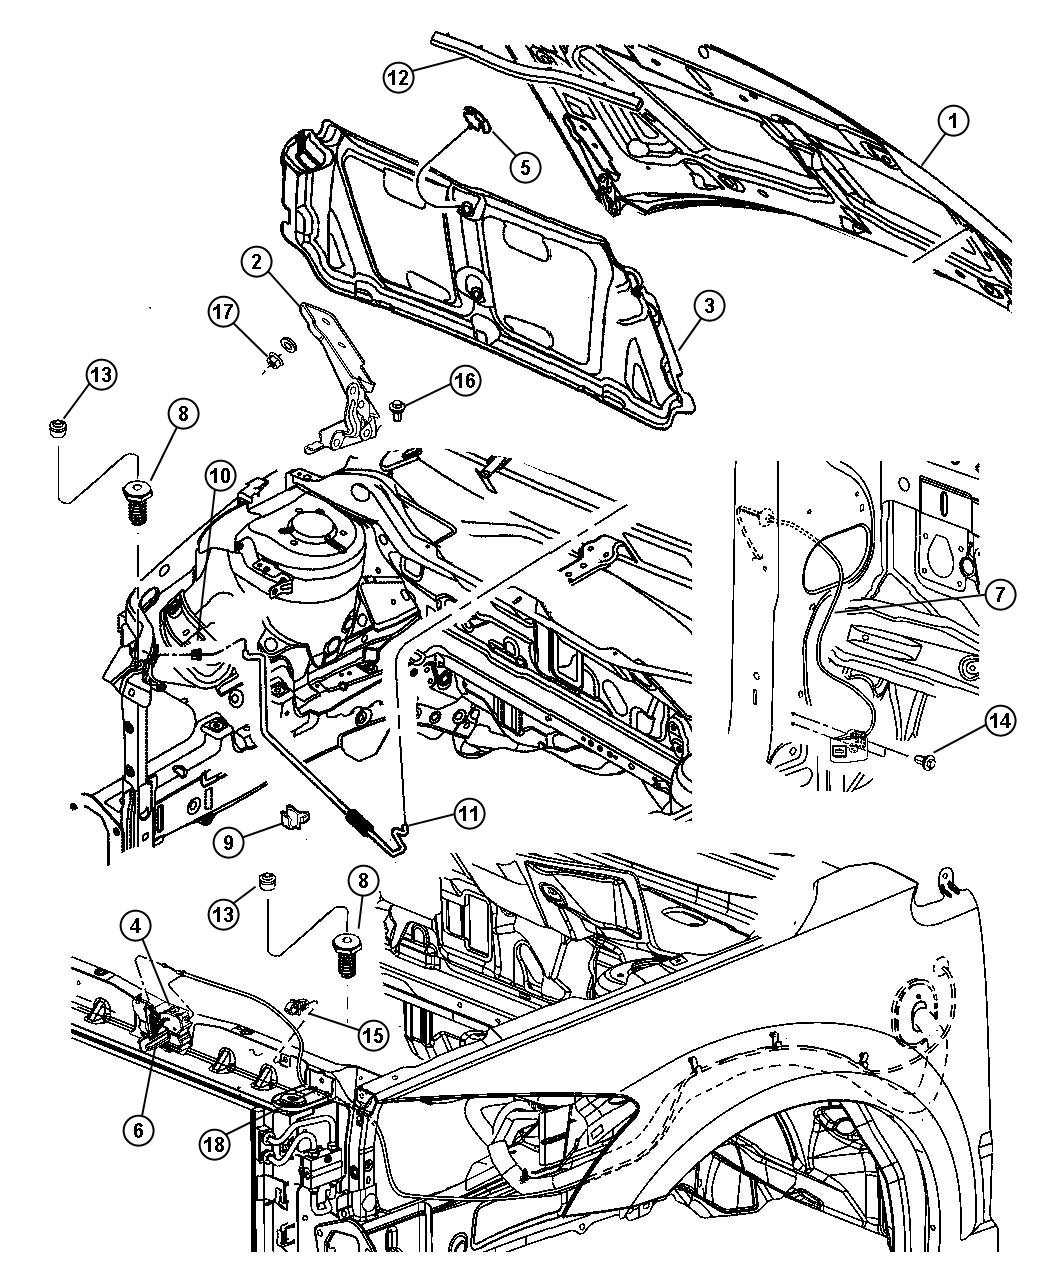 Dodge Caliber Reinforcement Hood Release